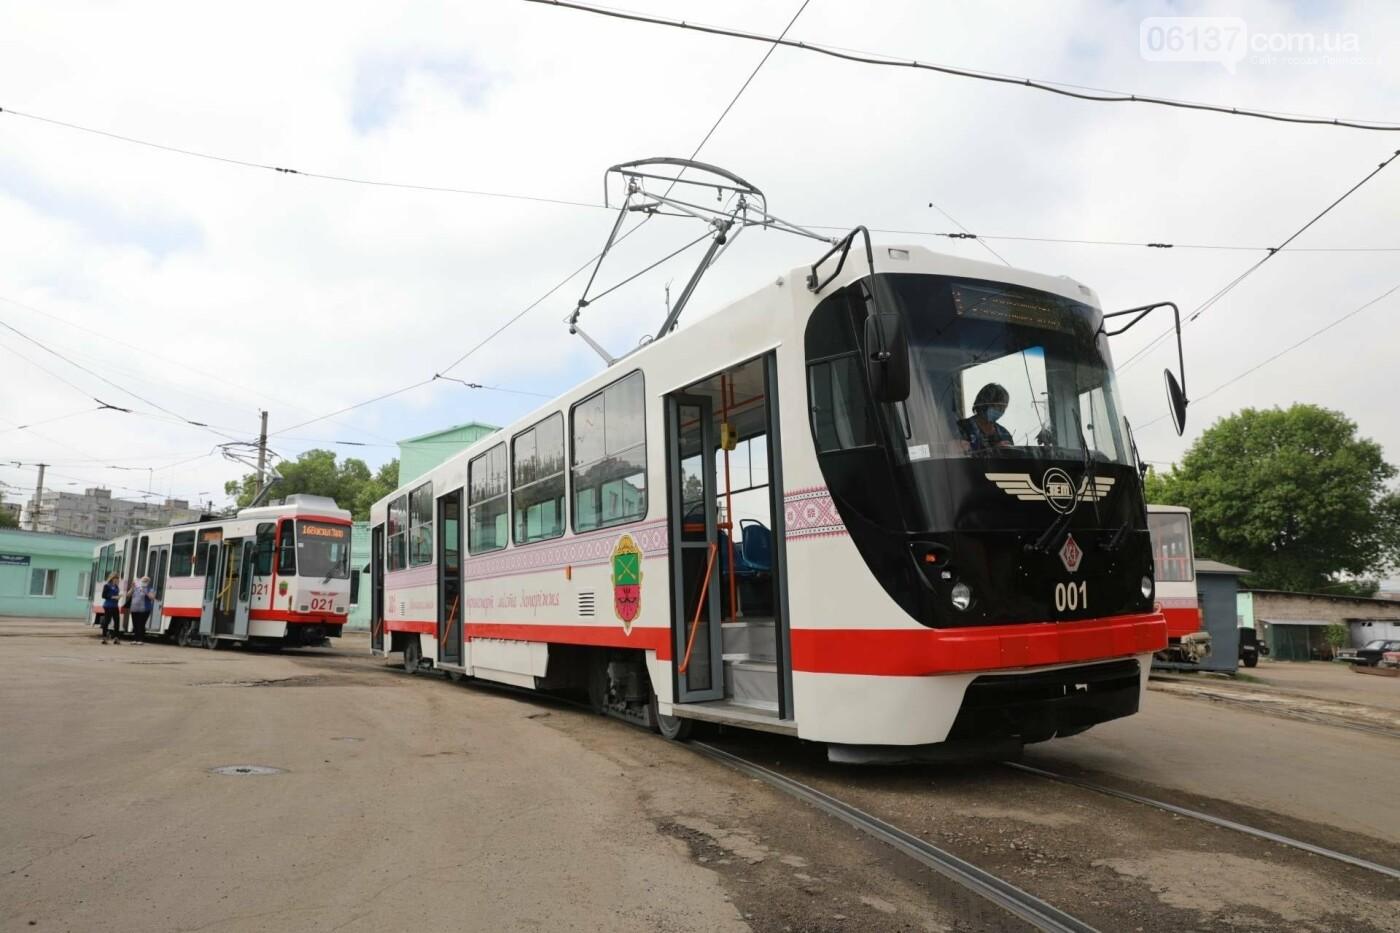 В Запорожье запустили еще один европейский трамвай. Фото, фото-5